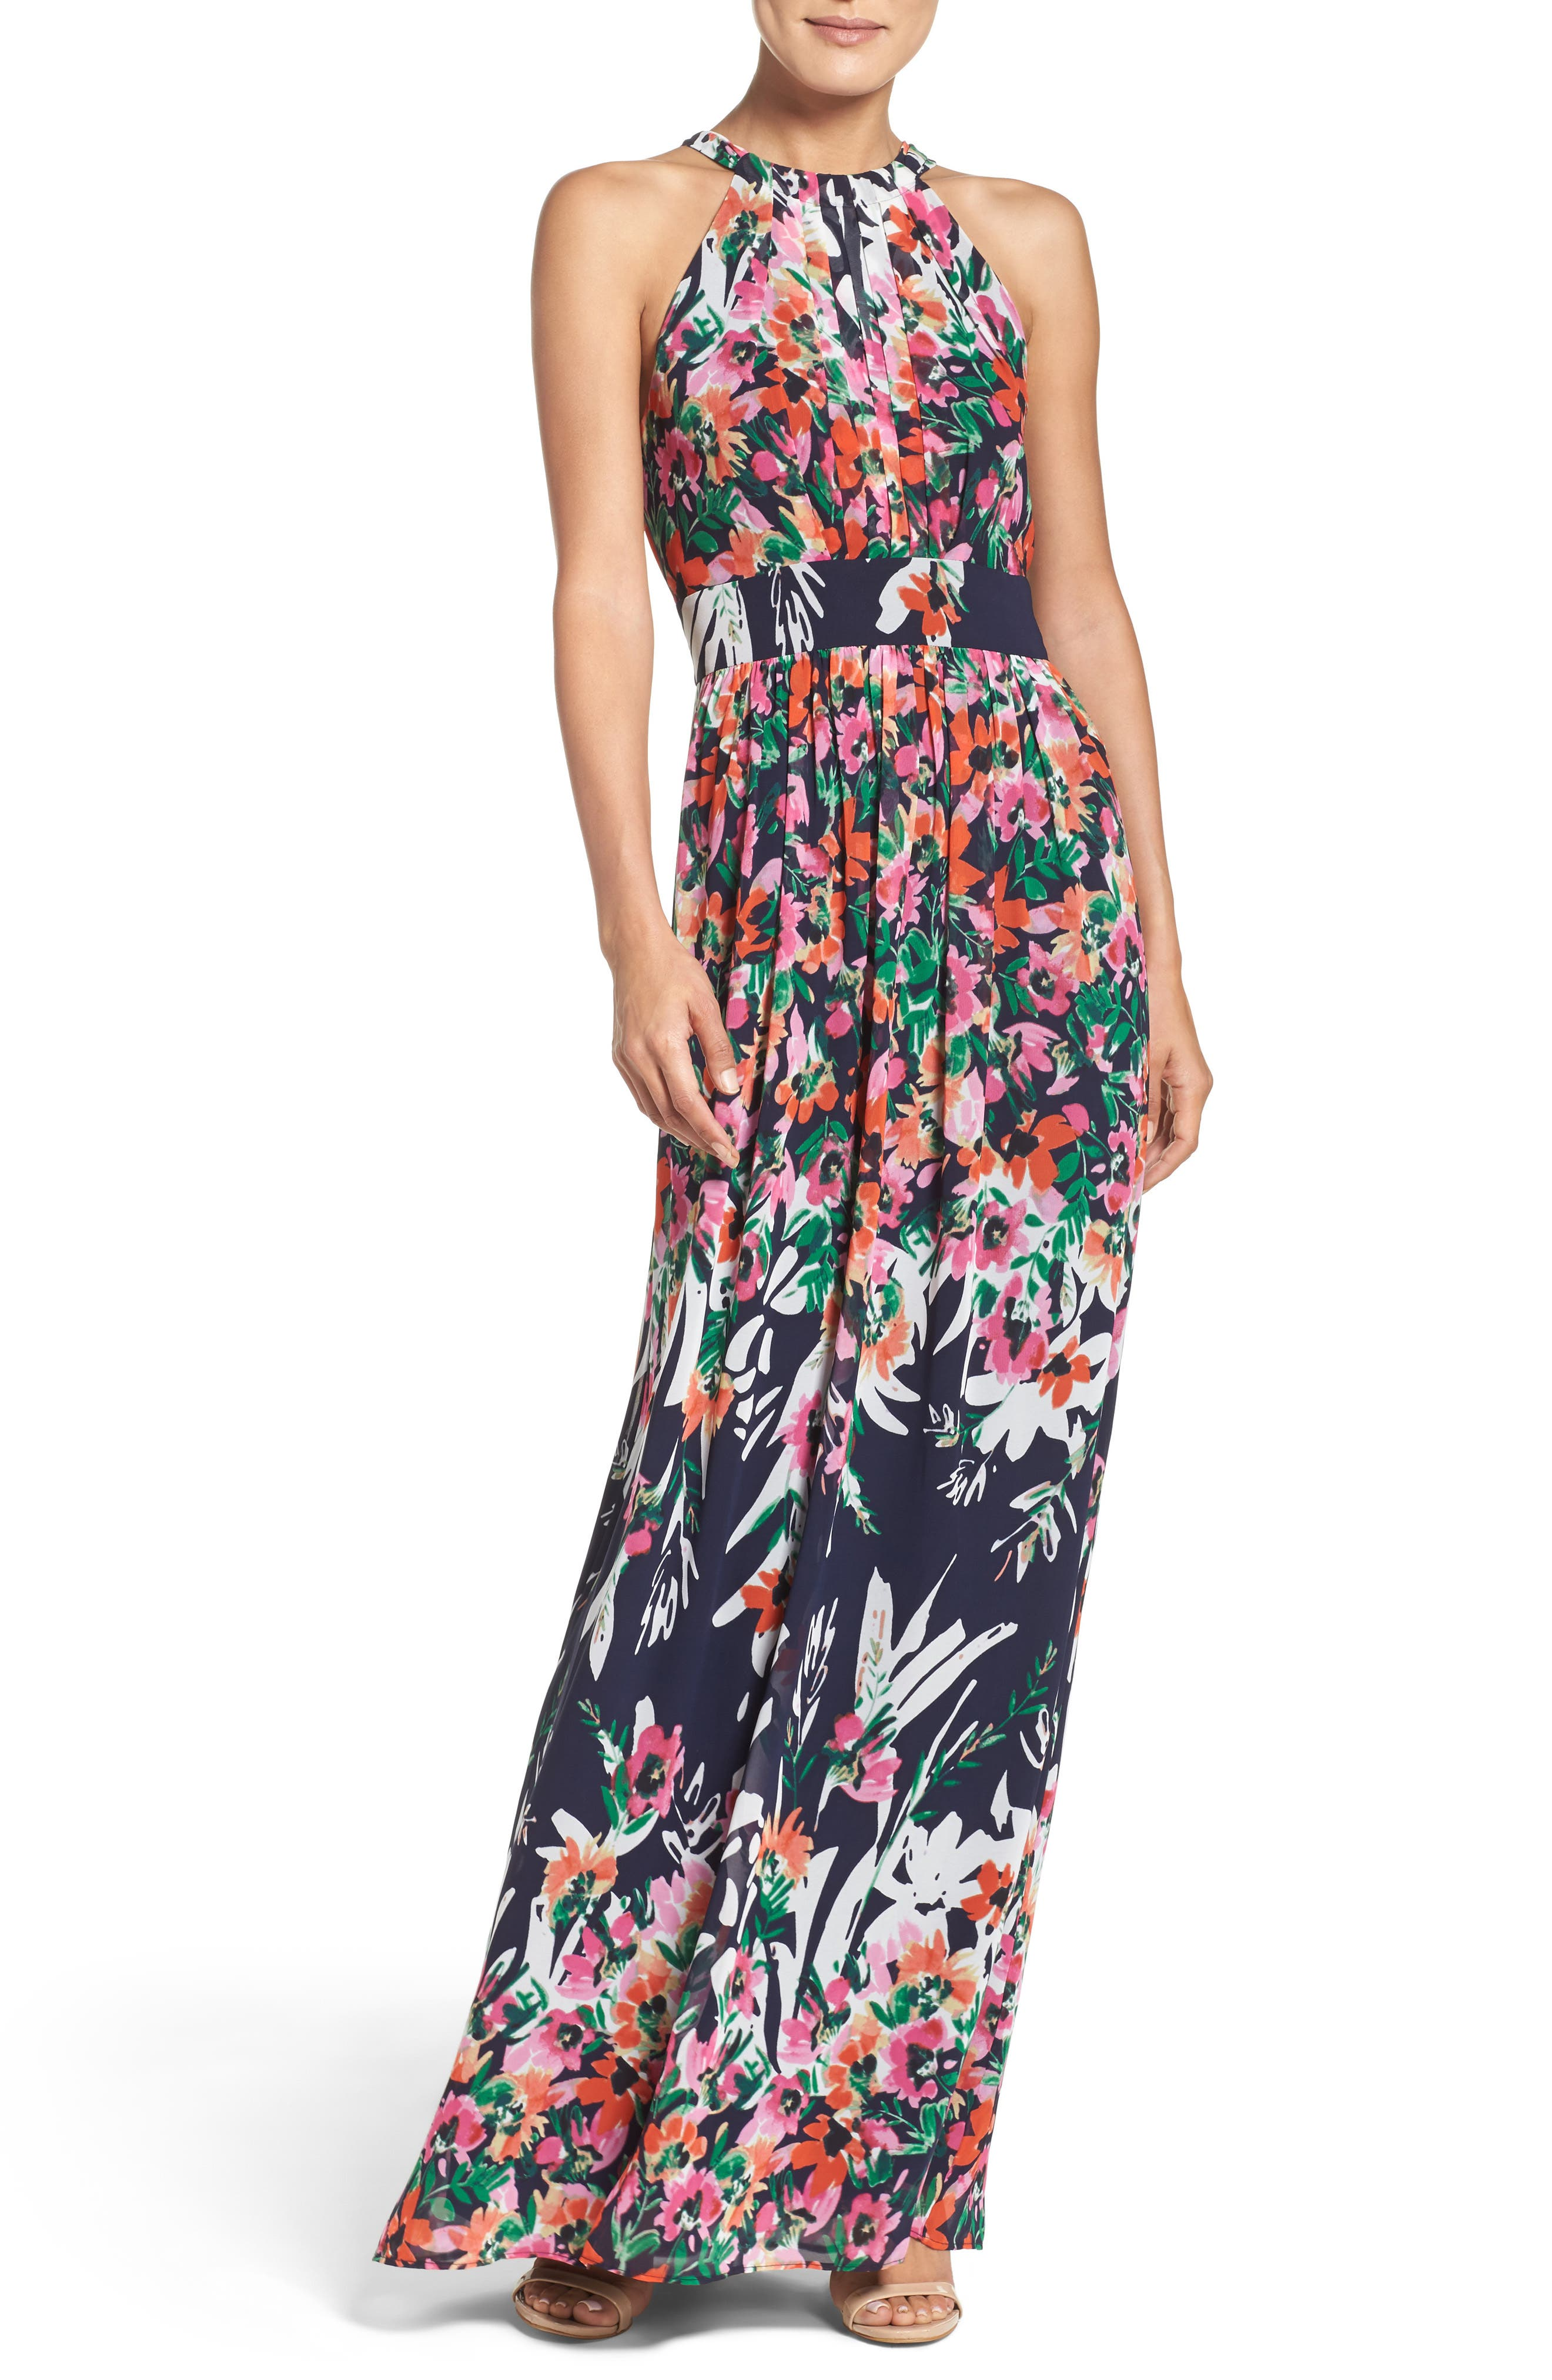 4491311d9714e Floral Print Chiffon Halter Maxi Dress in Navy/ Pink